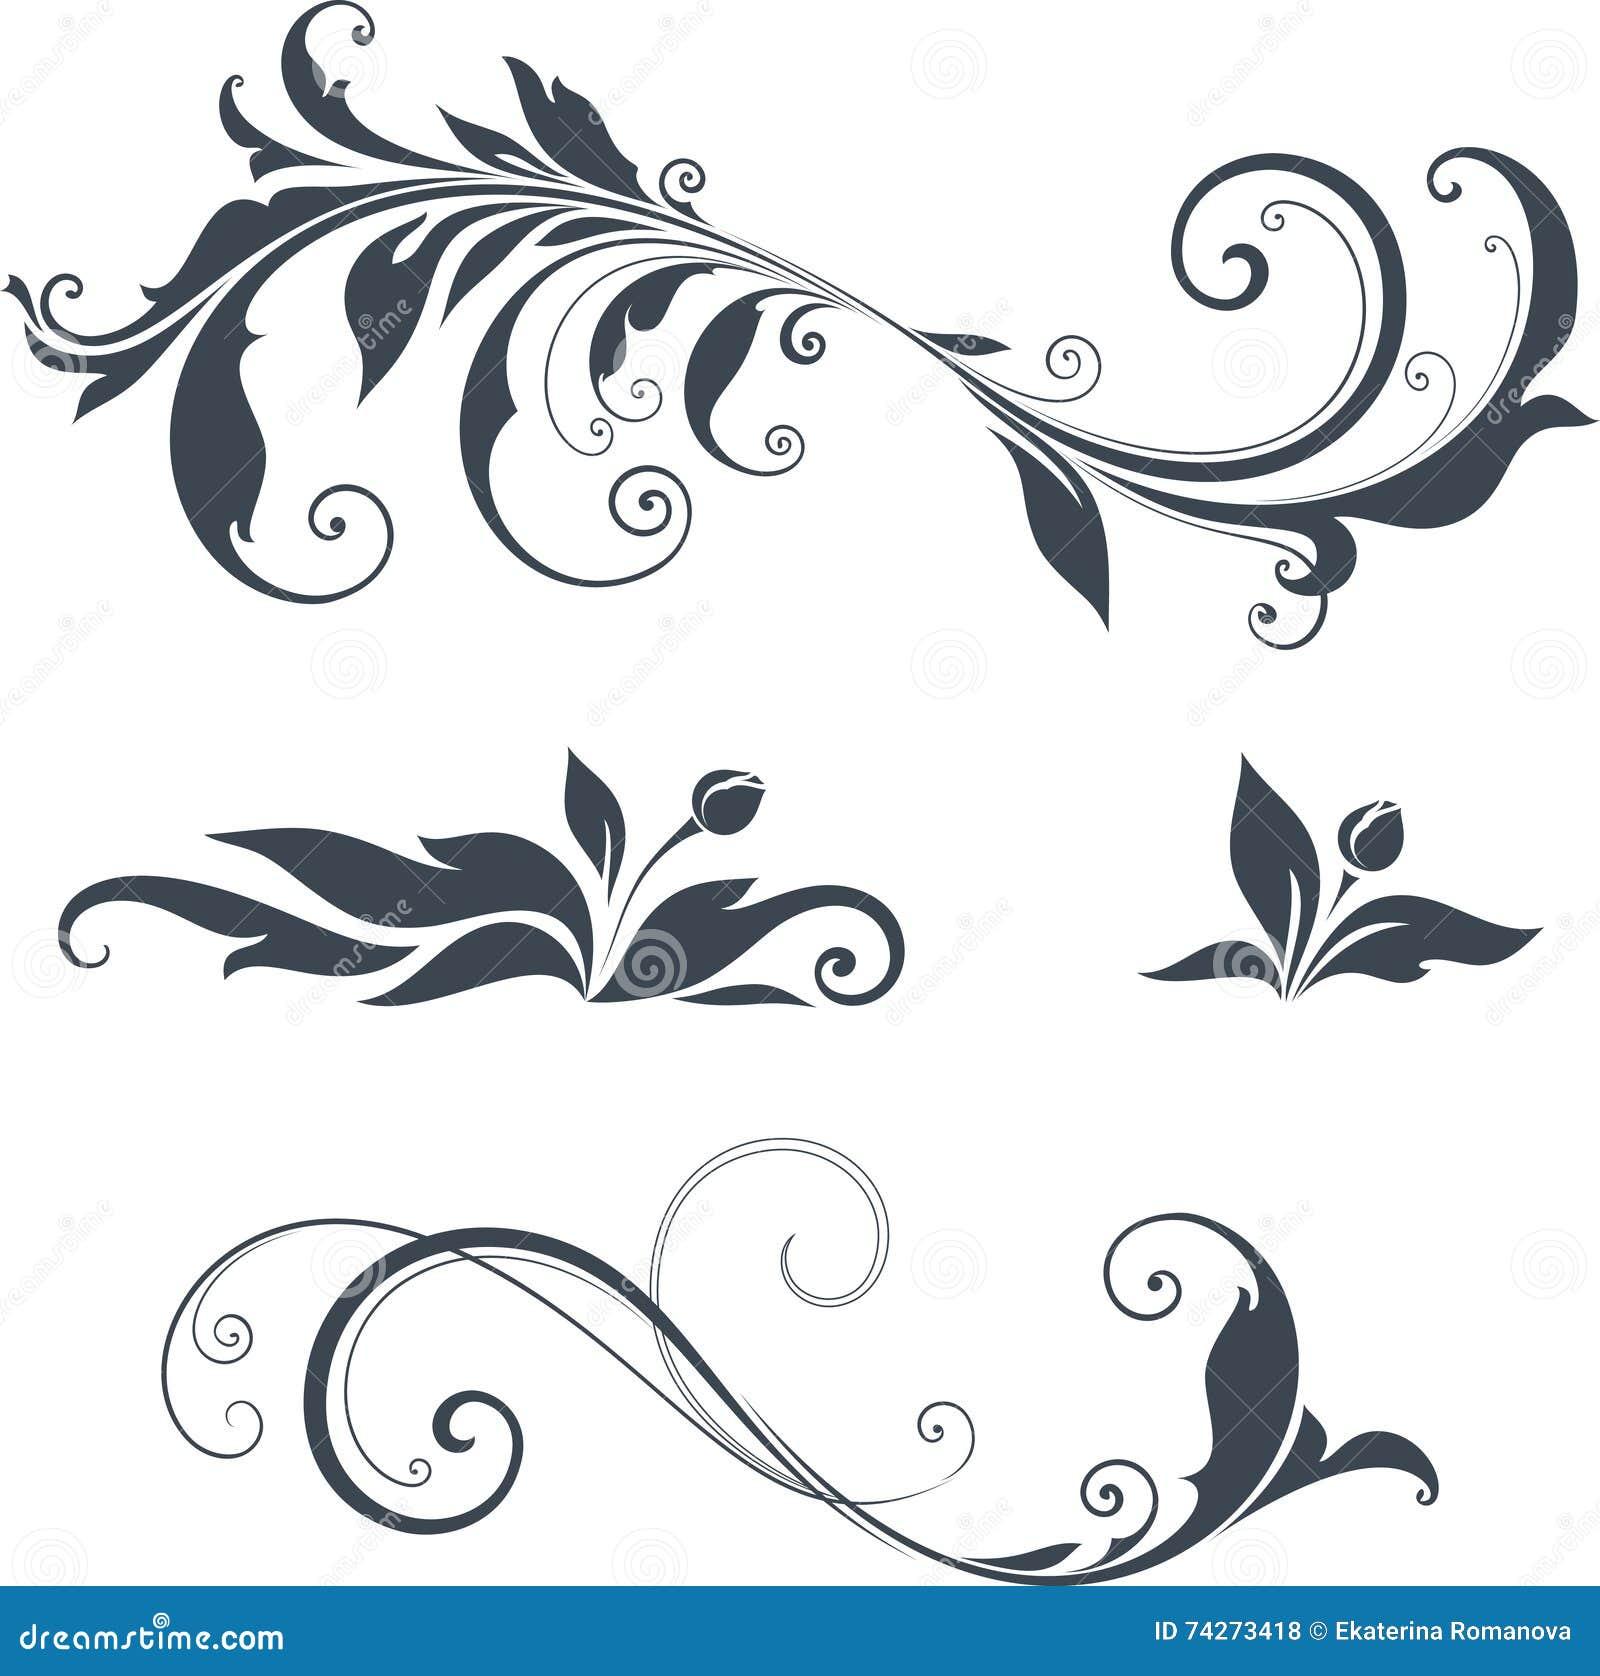 Ornate Motifs Design stock vector. Illustration of curl - 74273418